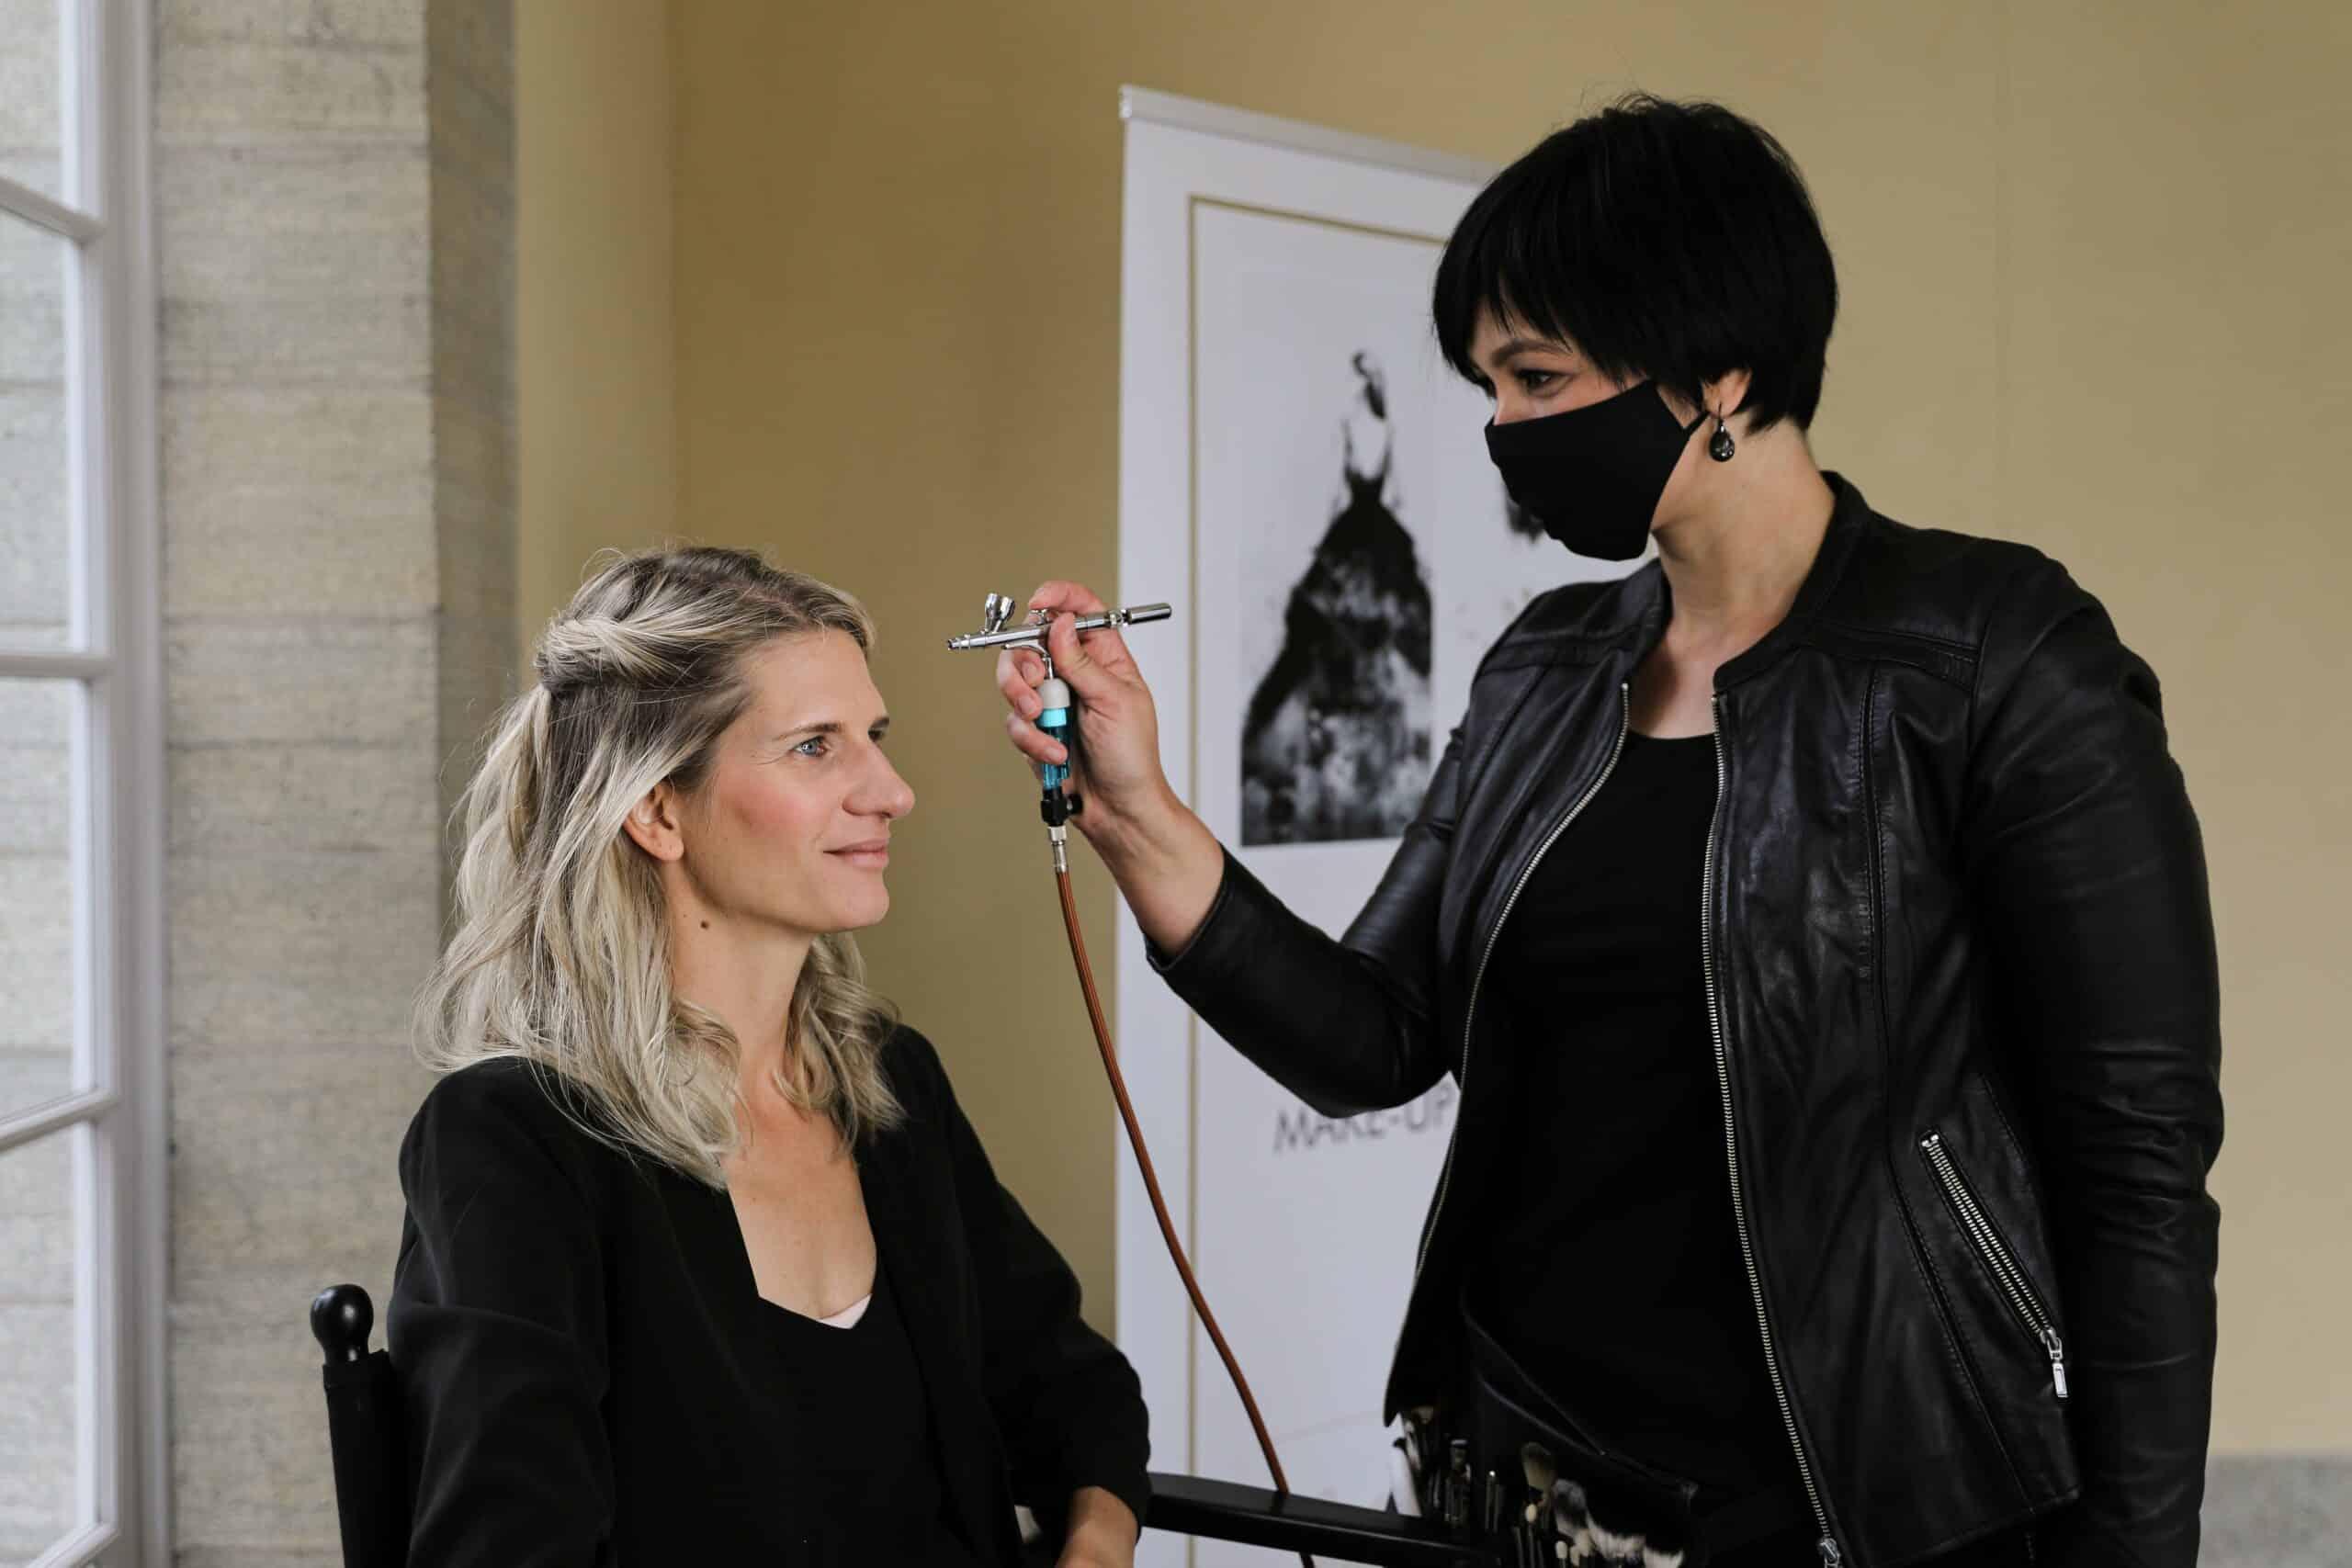 Freie Trauung Make-up